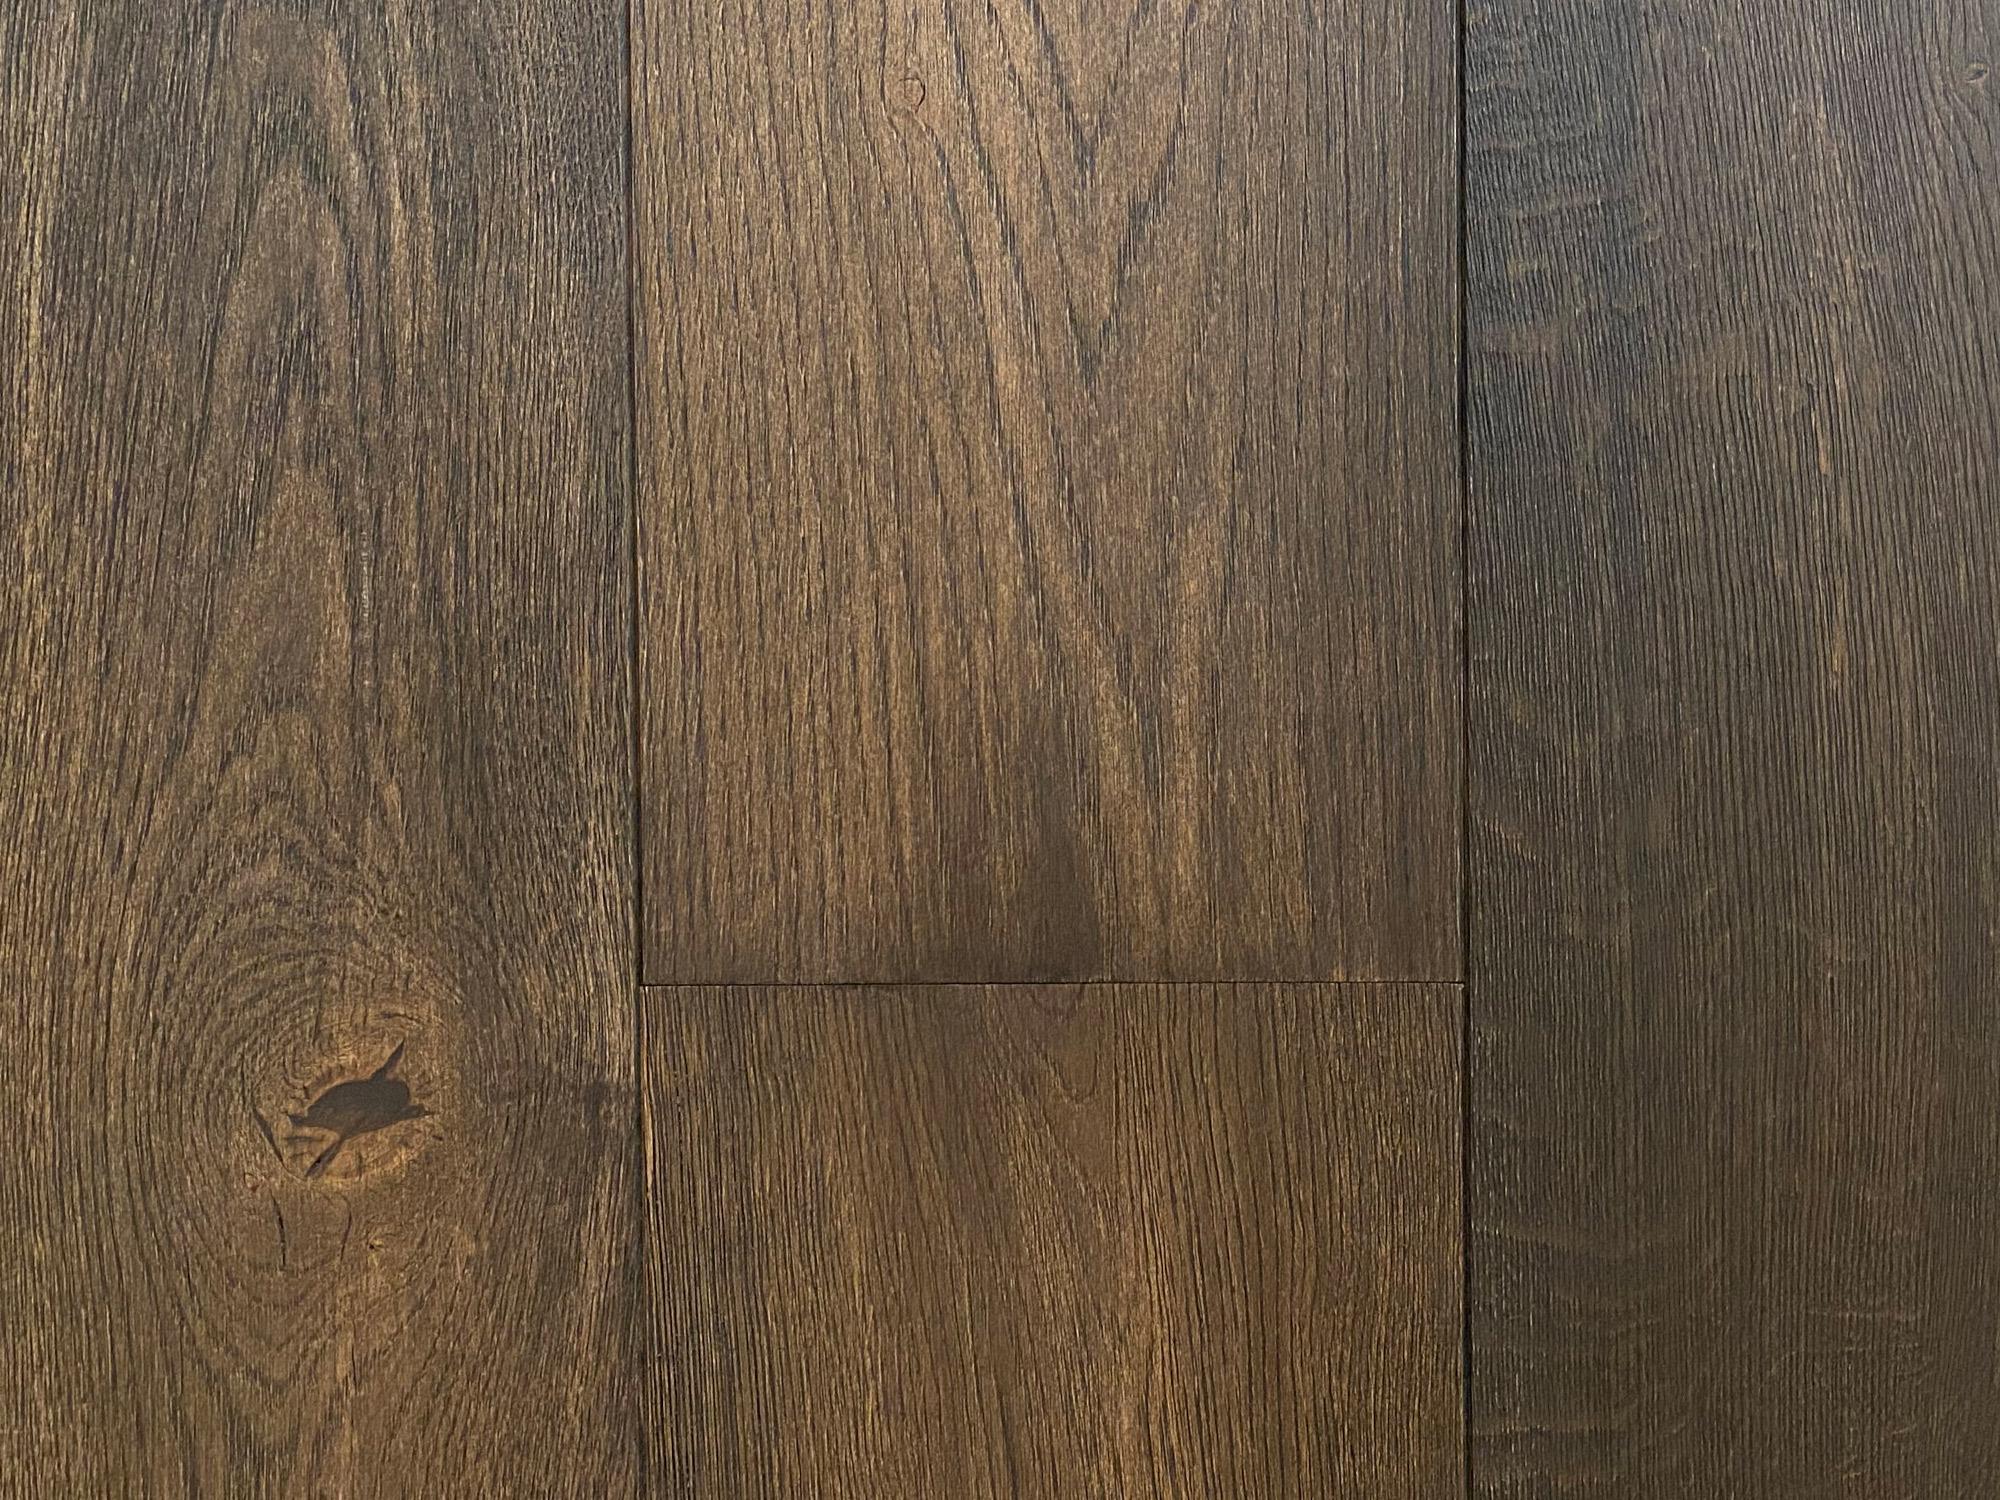 Dark oak engineered floor boards